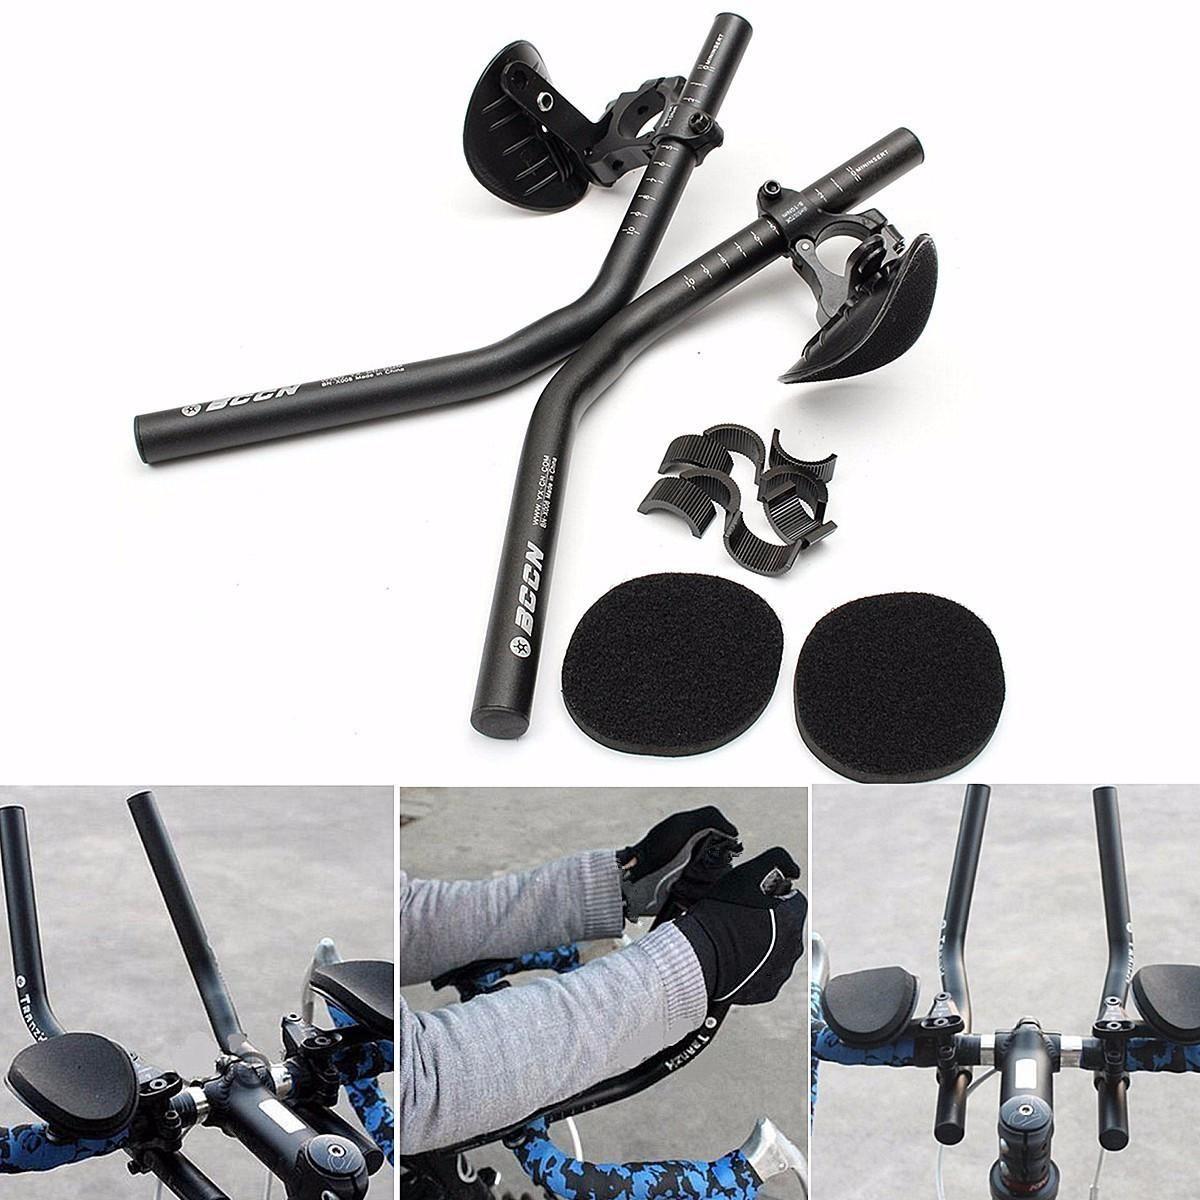 2c0ab025b72 Sports & Outdoors Bicycle Armrest Handlebars Rest Handlebar Relaxation  Handlebars for Racing Bikes MTB Mountain Bikes